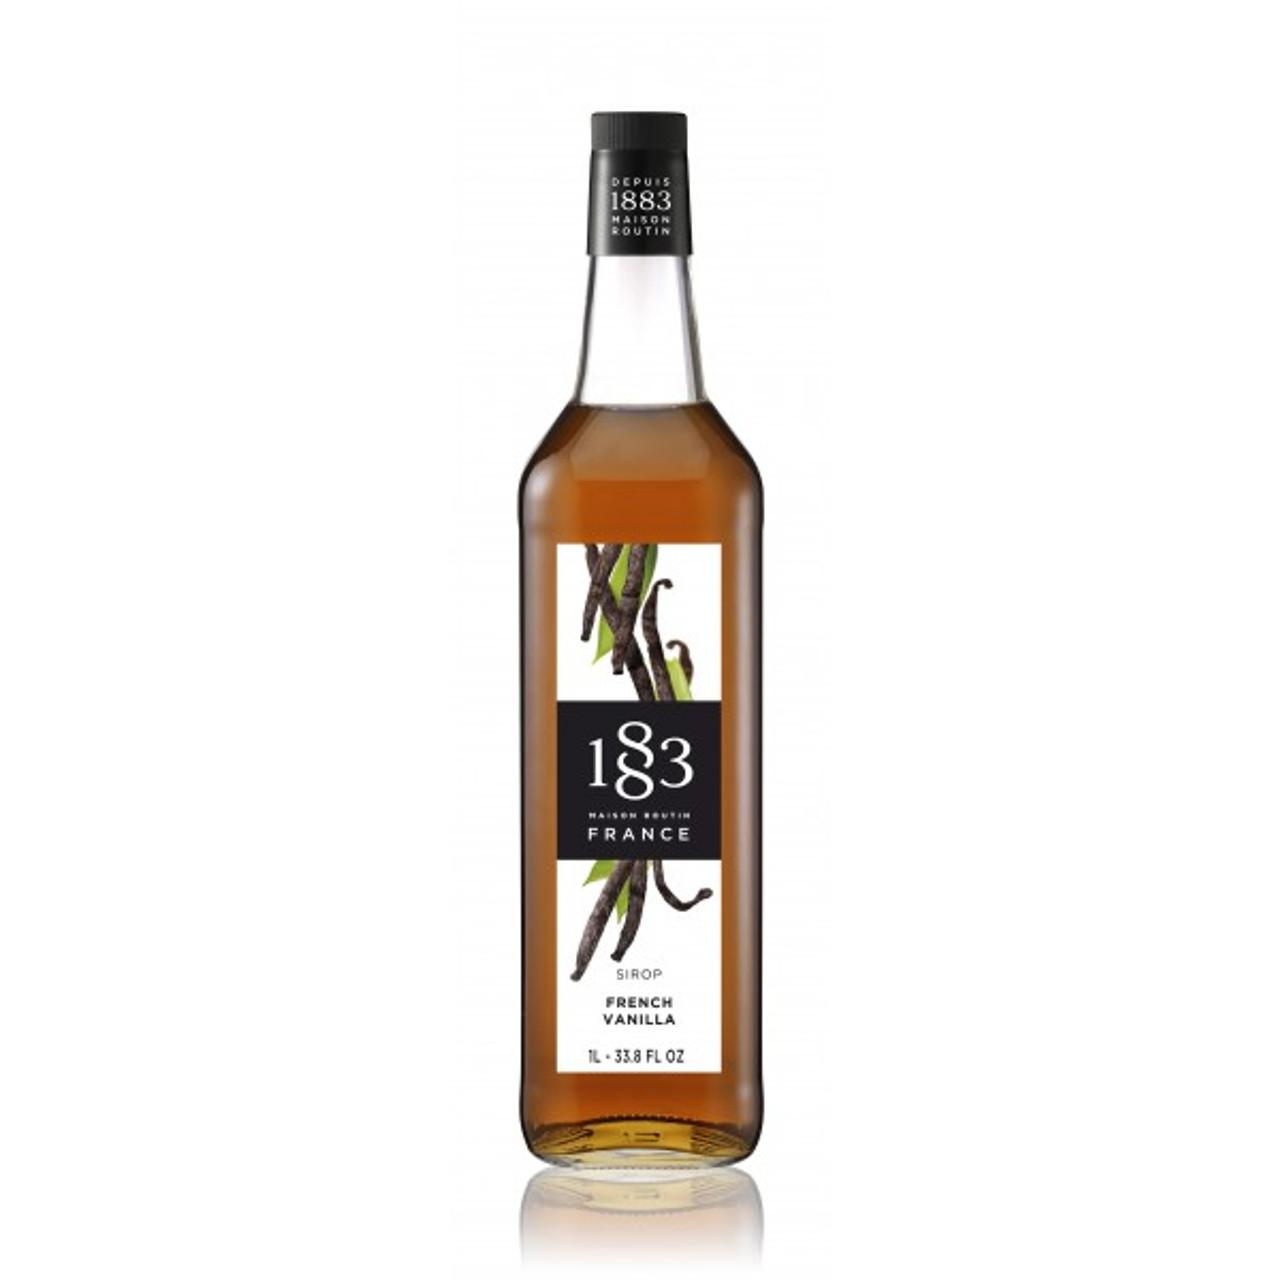 1883 Syrup French Vanilla - 1L (Glass Bottle)